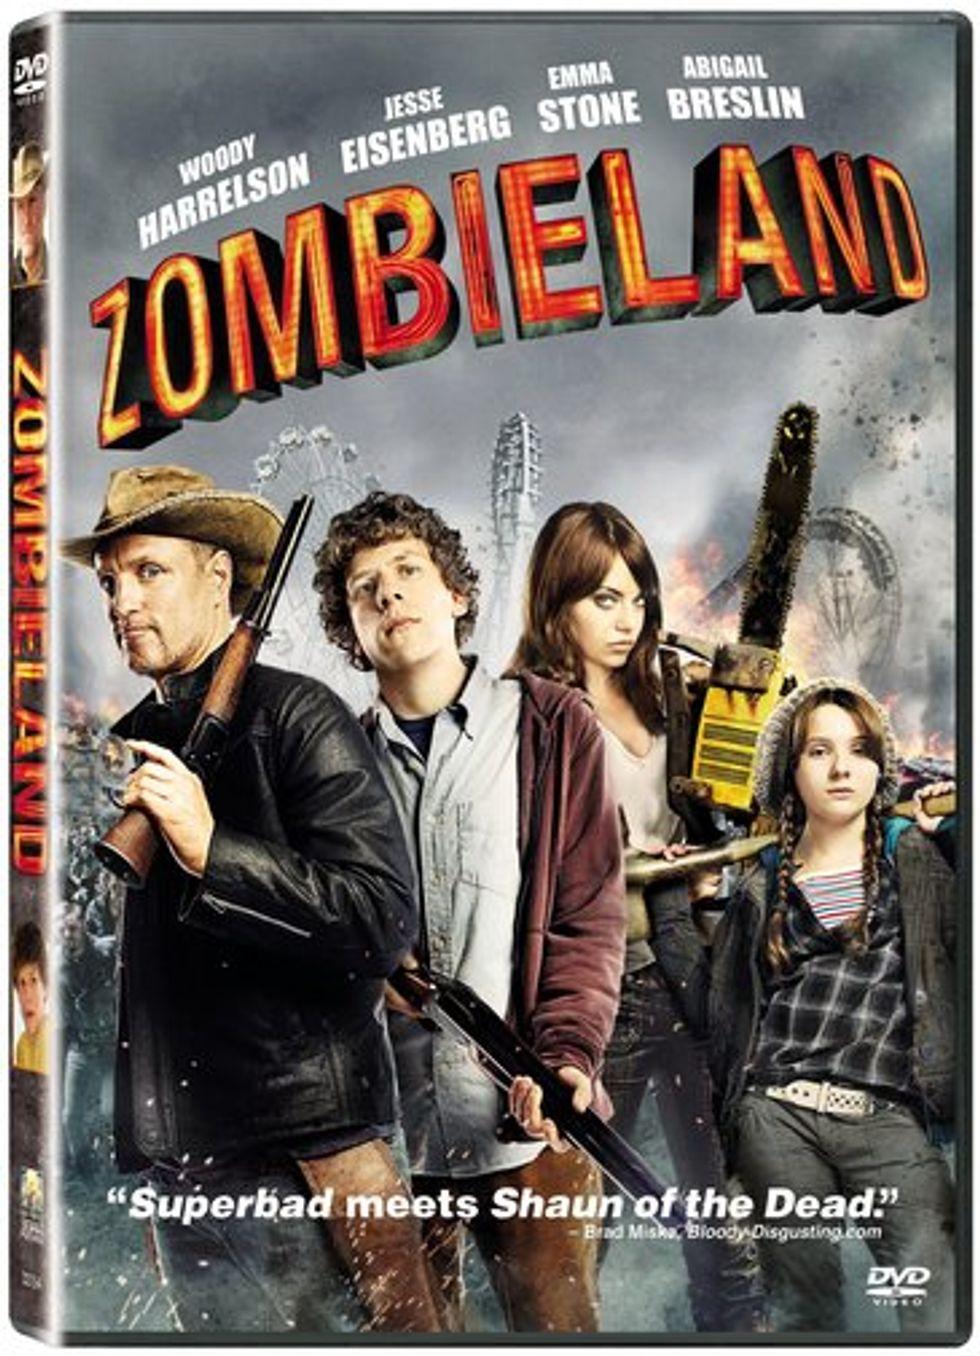 Zombieland On DVD!